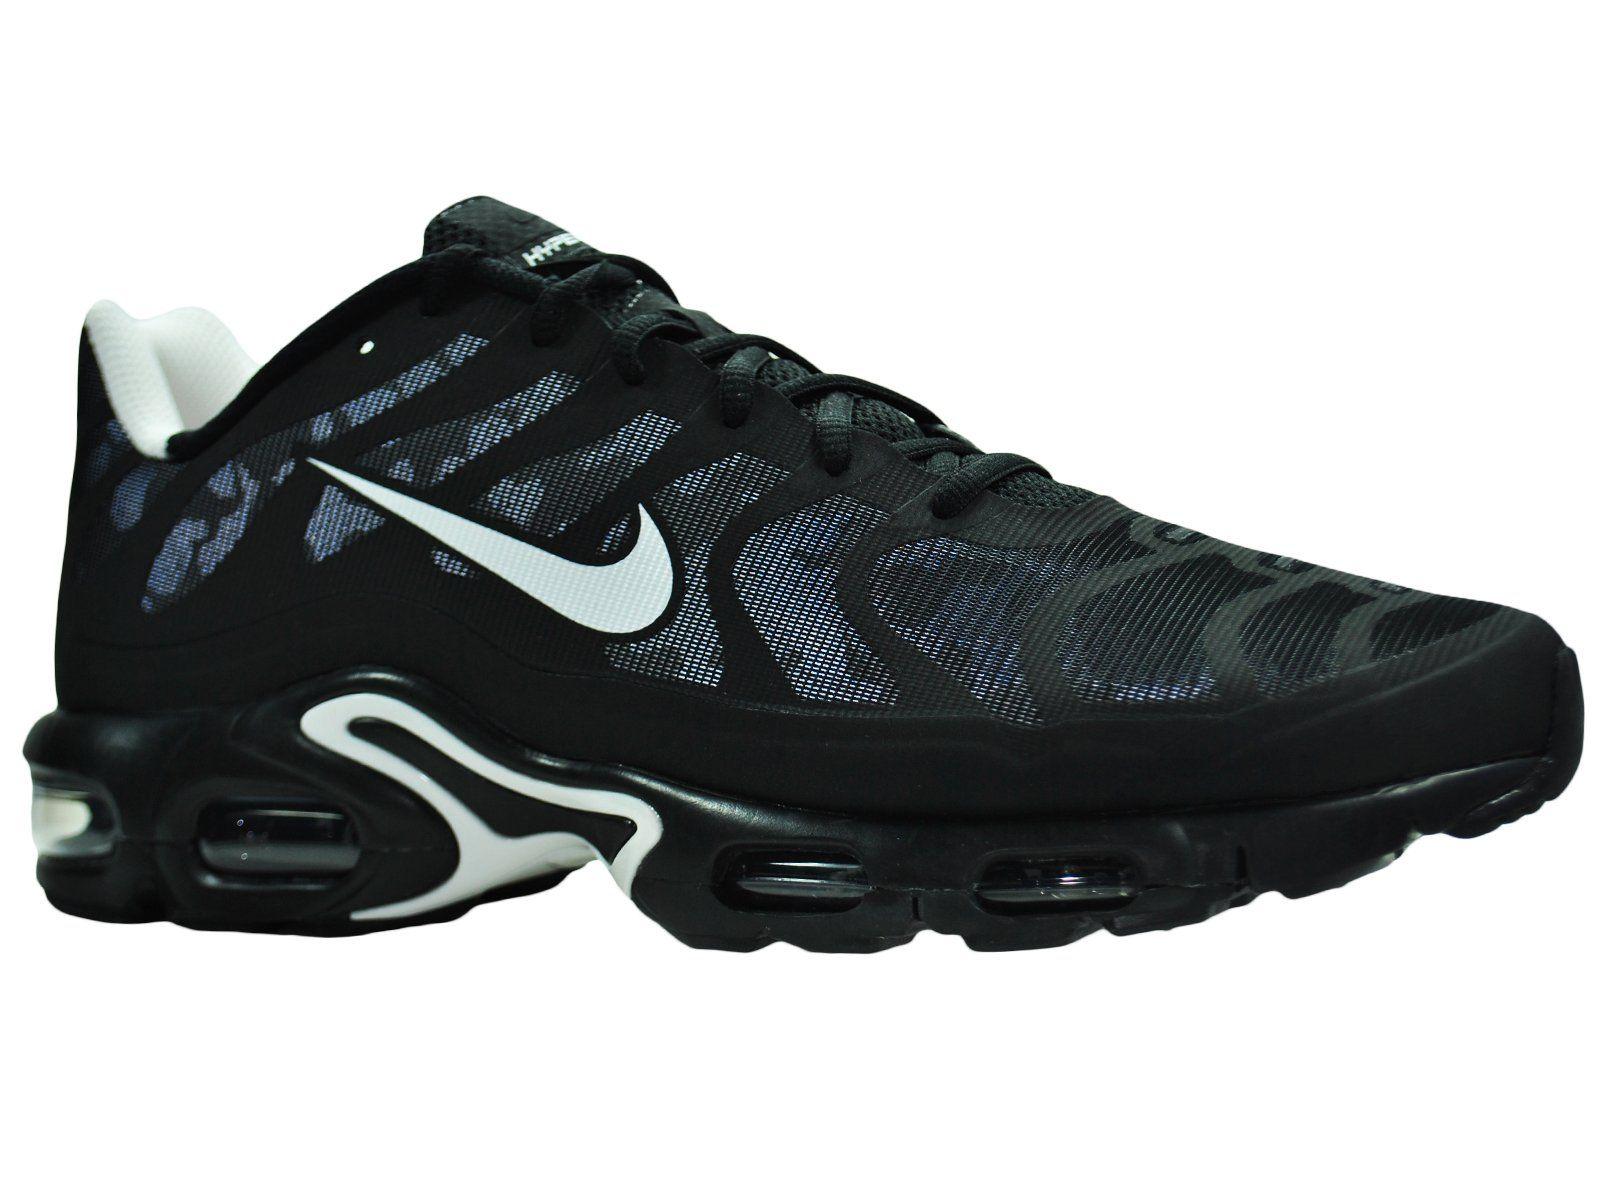 Nike Hommes Air Max, Plus Mesh Chaussures Cross-trainers Pour Les Femmes